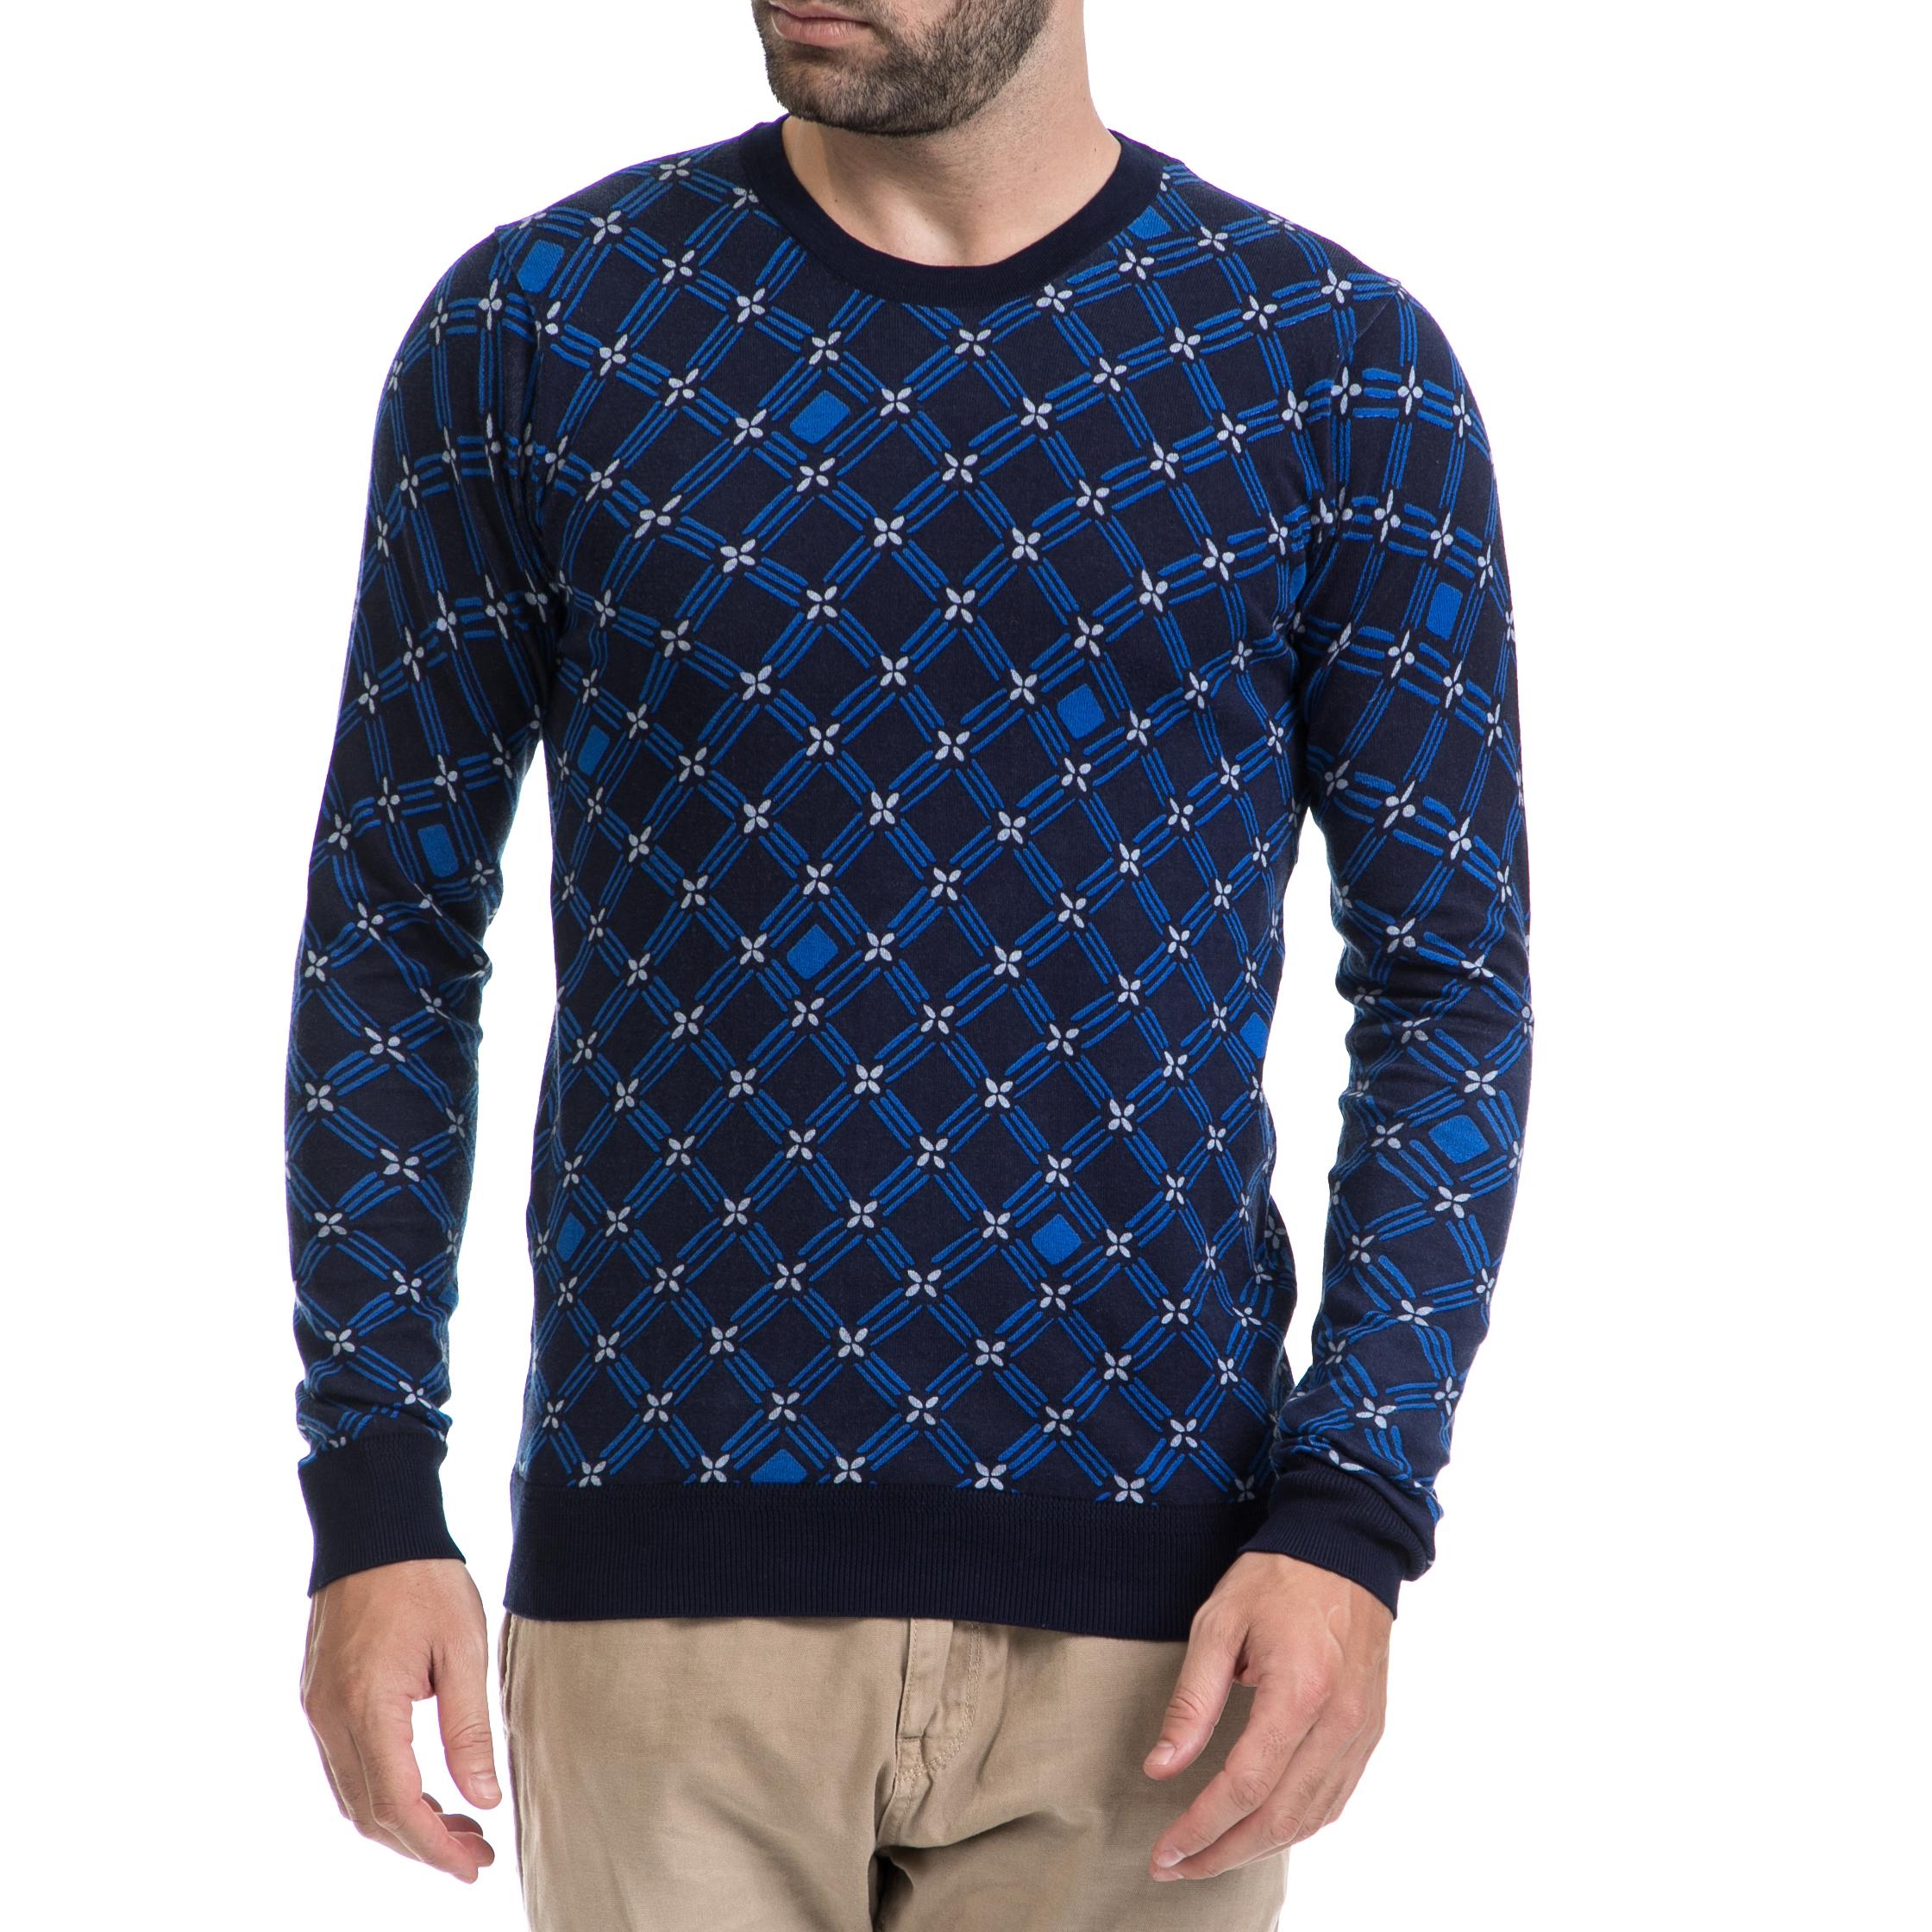 SCOTCH & SODA - Ανδρική μπλούζα SCOTCH & SODA μπλε ανδρικά ρούχα πλεκτά ζακέτες μπλούζες